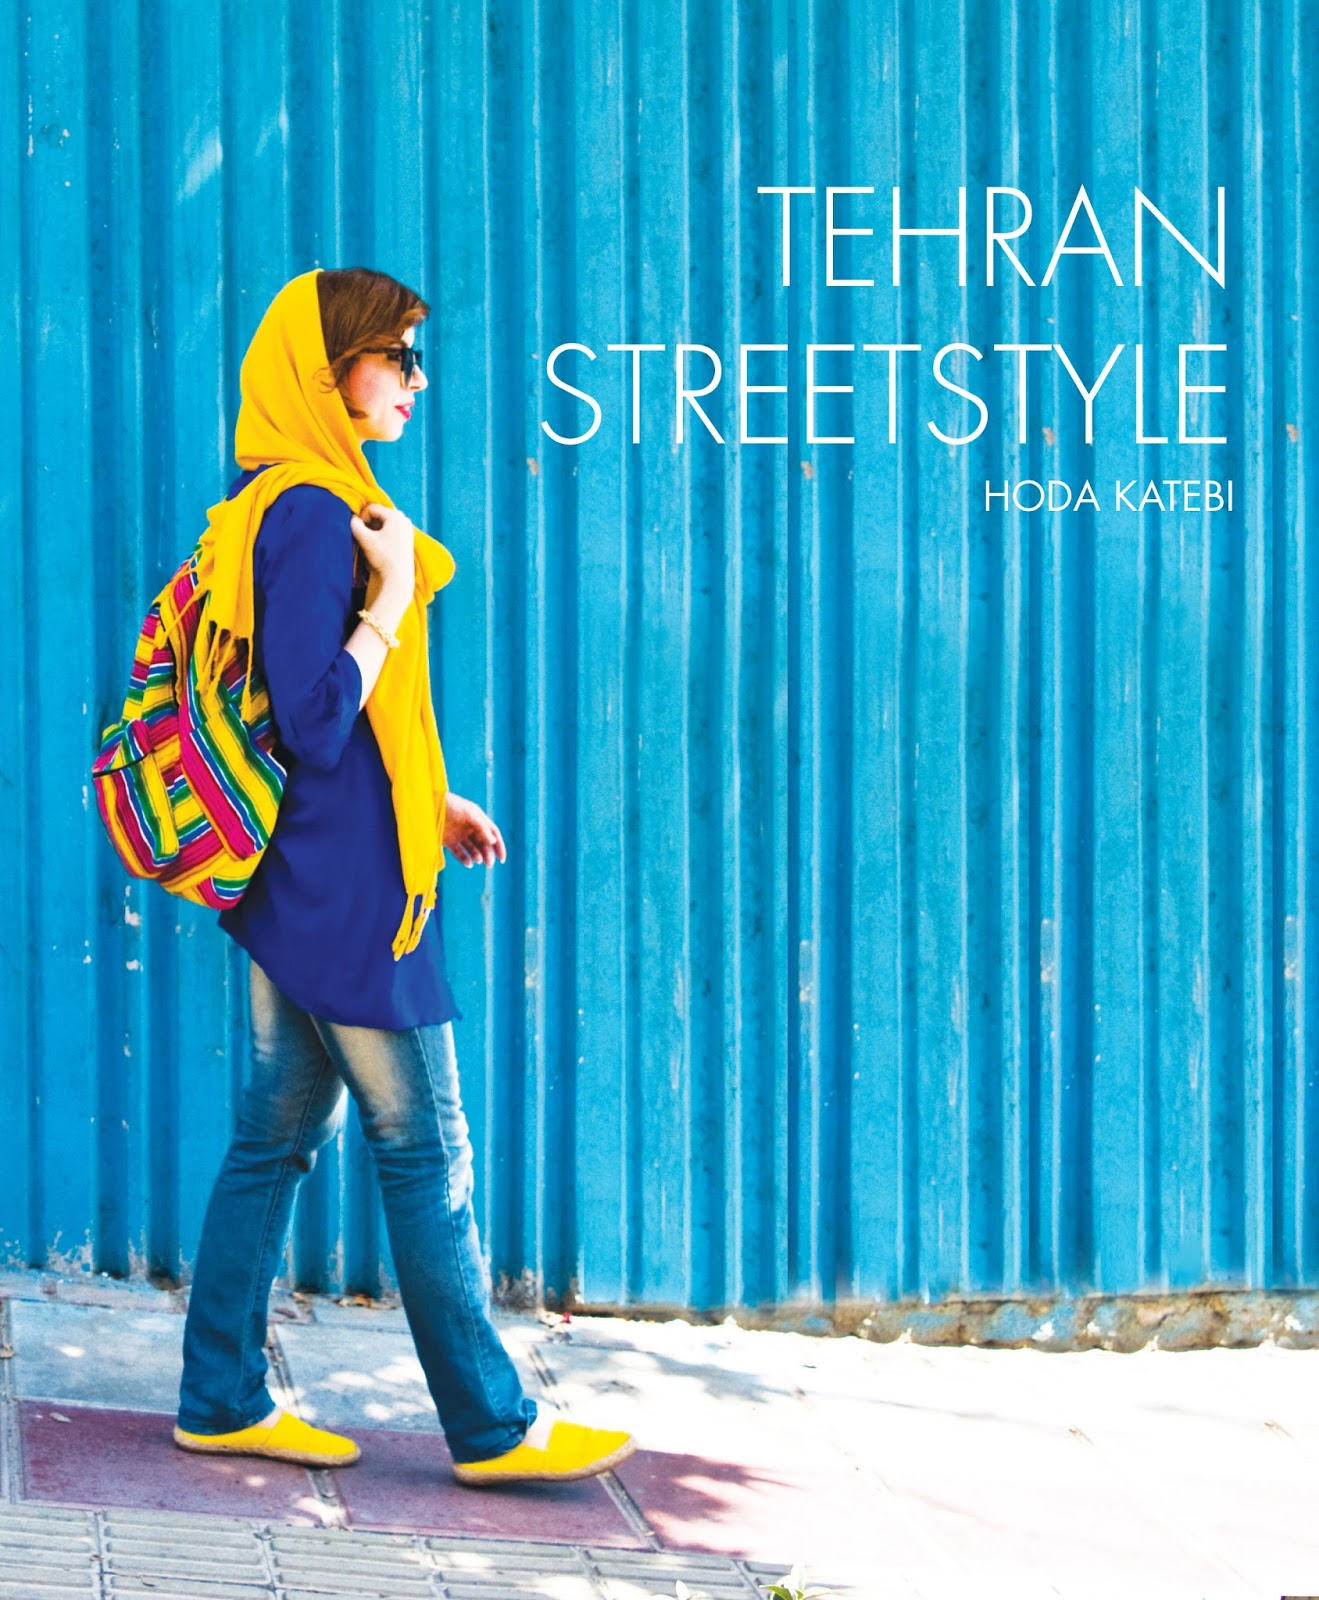 Iran fashion, Iranian fashion, Iran streetstyle, Iranian streetstyle, Middle east fashion, muslim fashion, muslim streetstyle